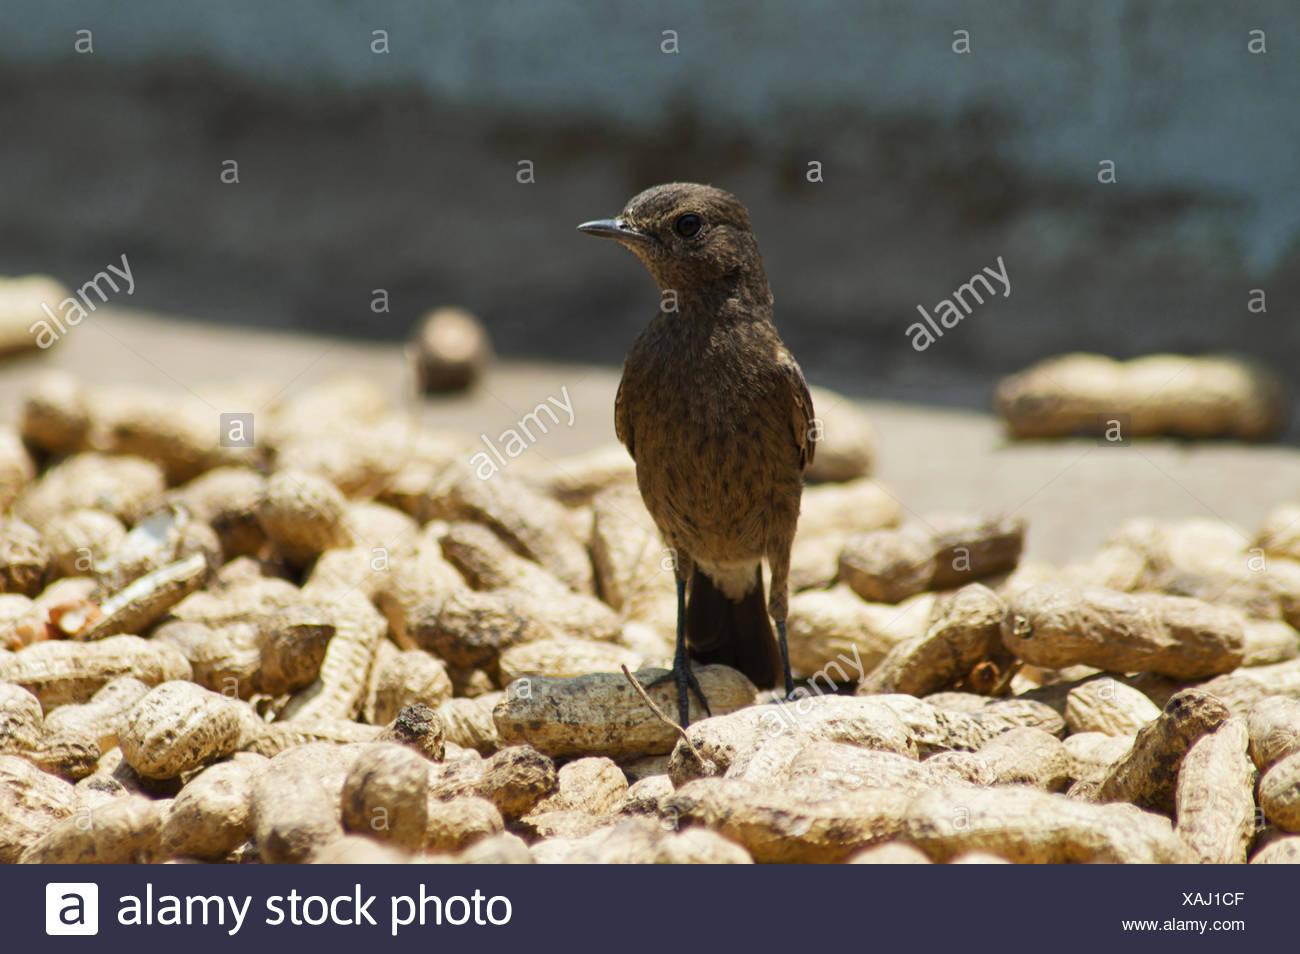 Pied Indian Bushchat (Saxicola caprata), Sangli, Maharashtra, India - Stock Image